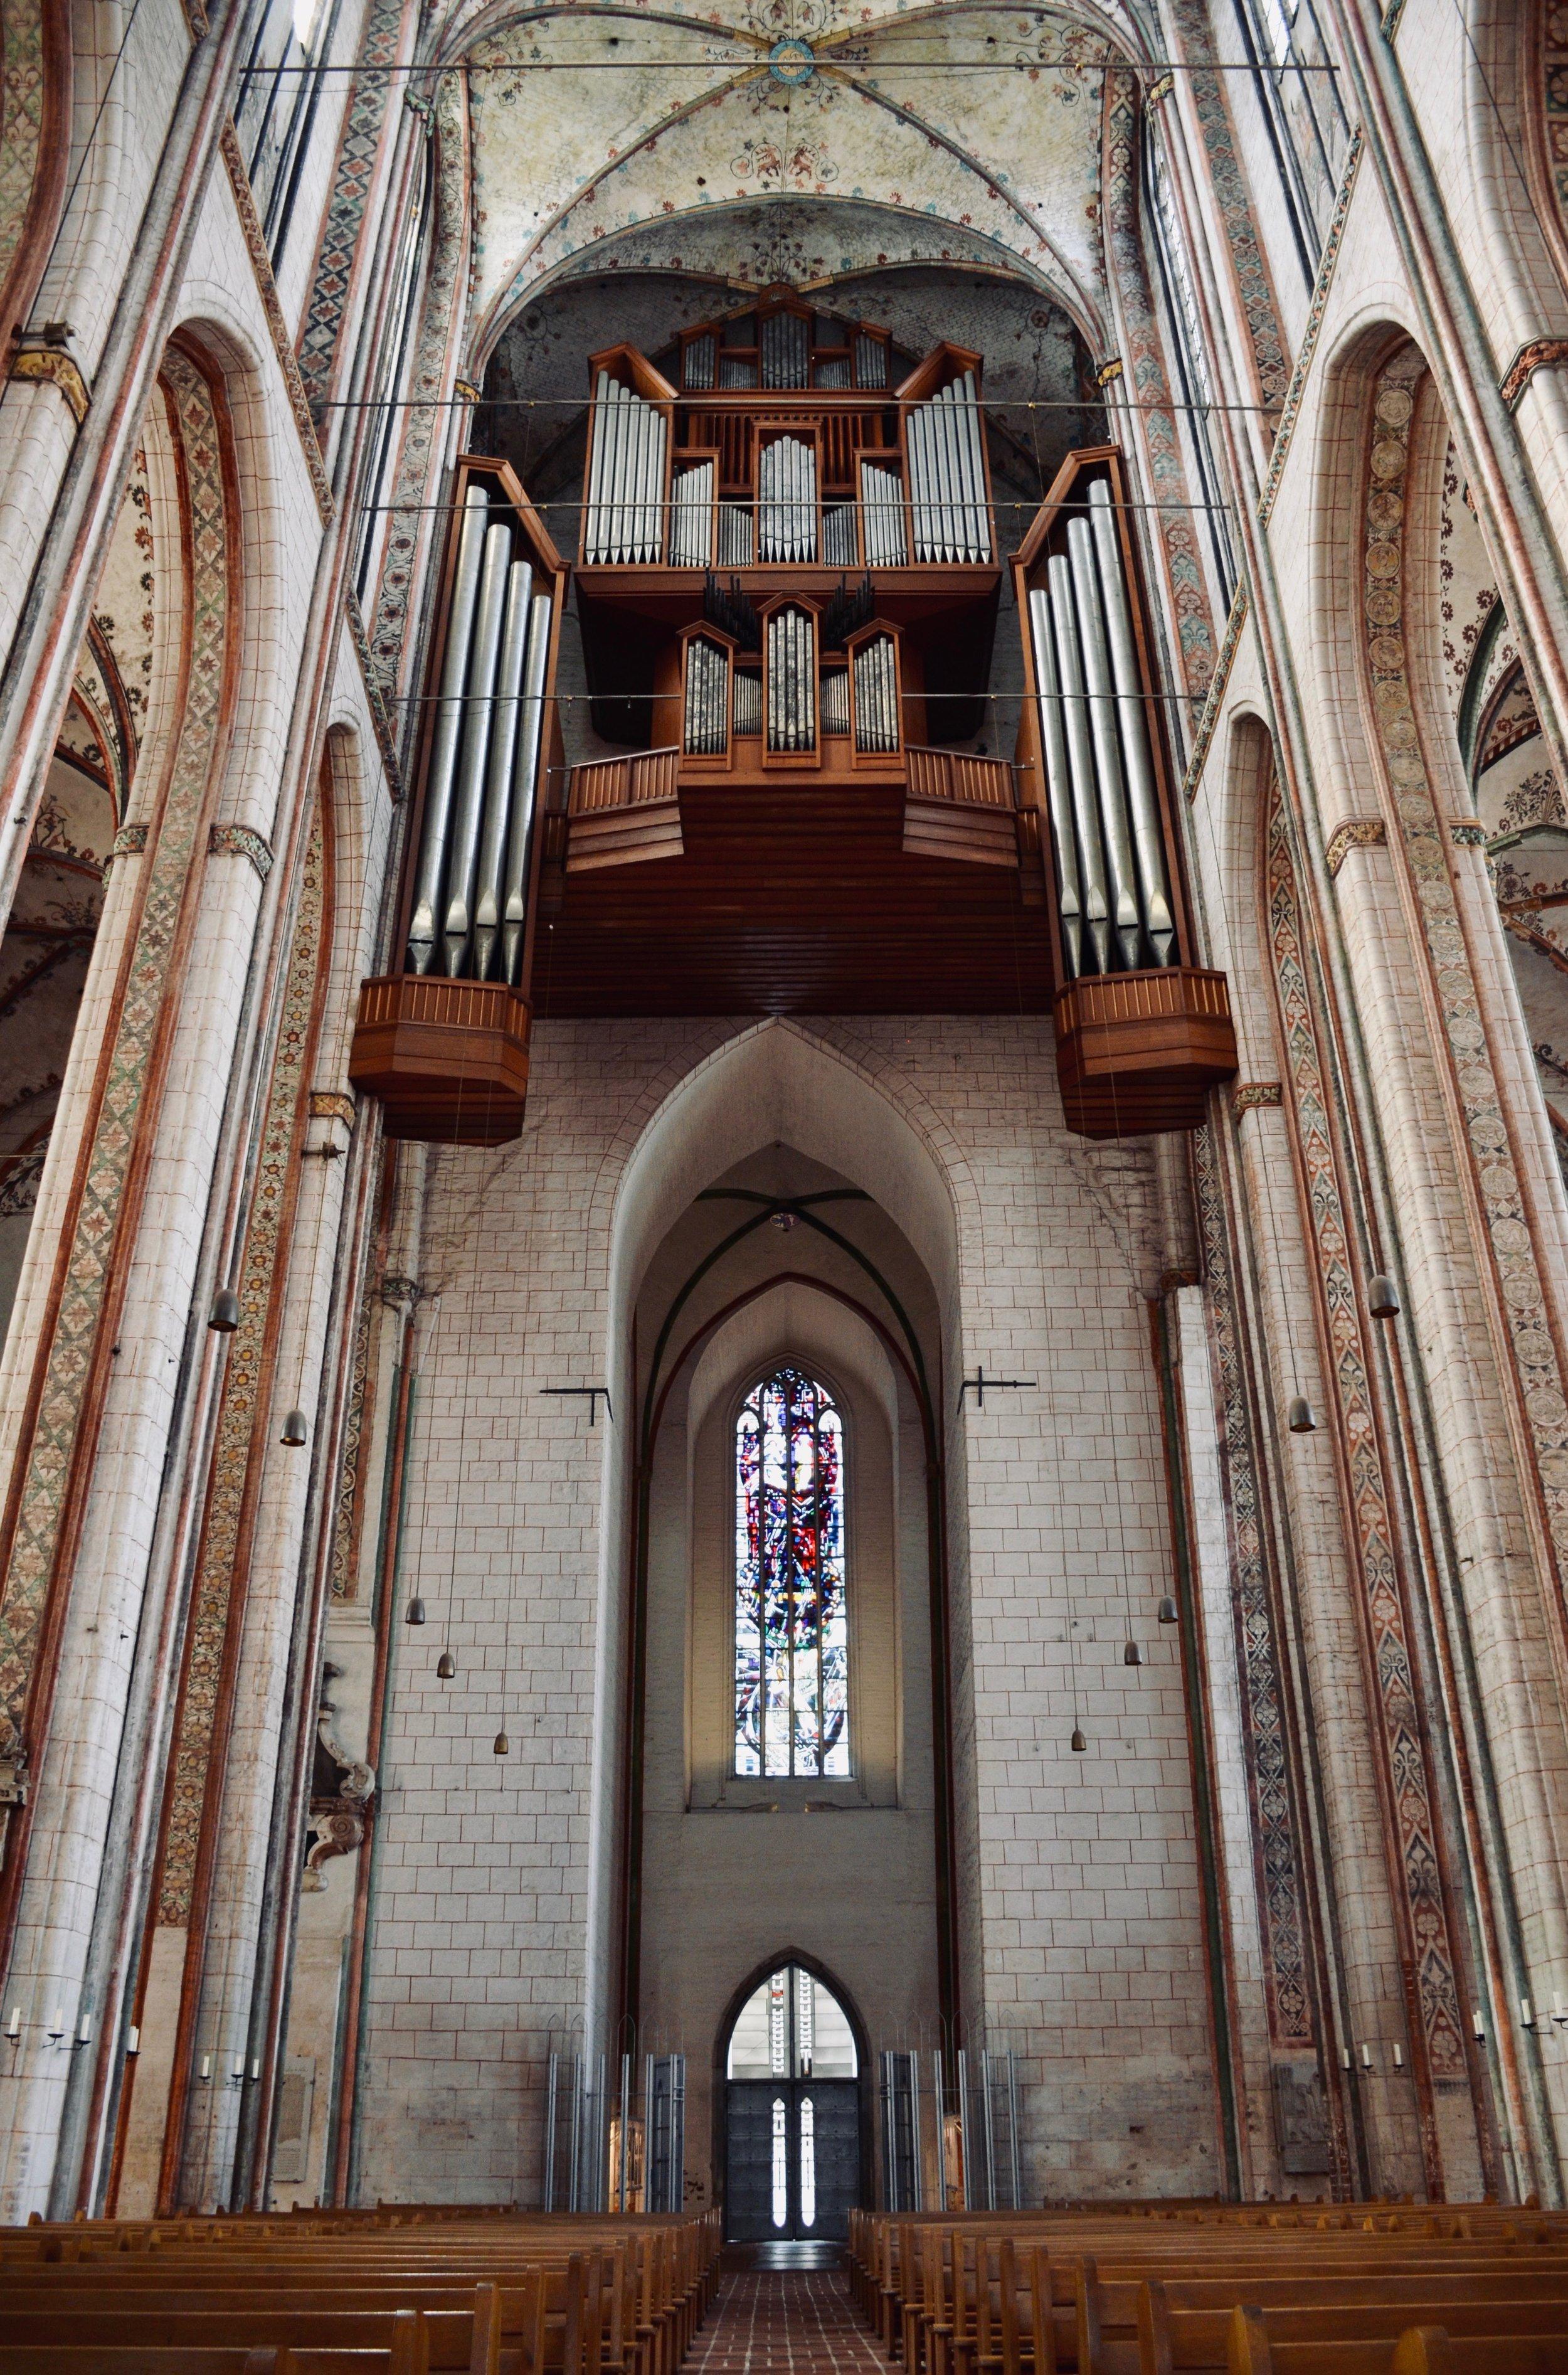 1968 Kemper & Son organ, Marienkirche, Lübeck.